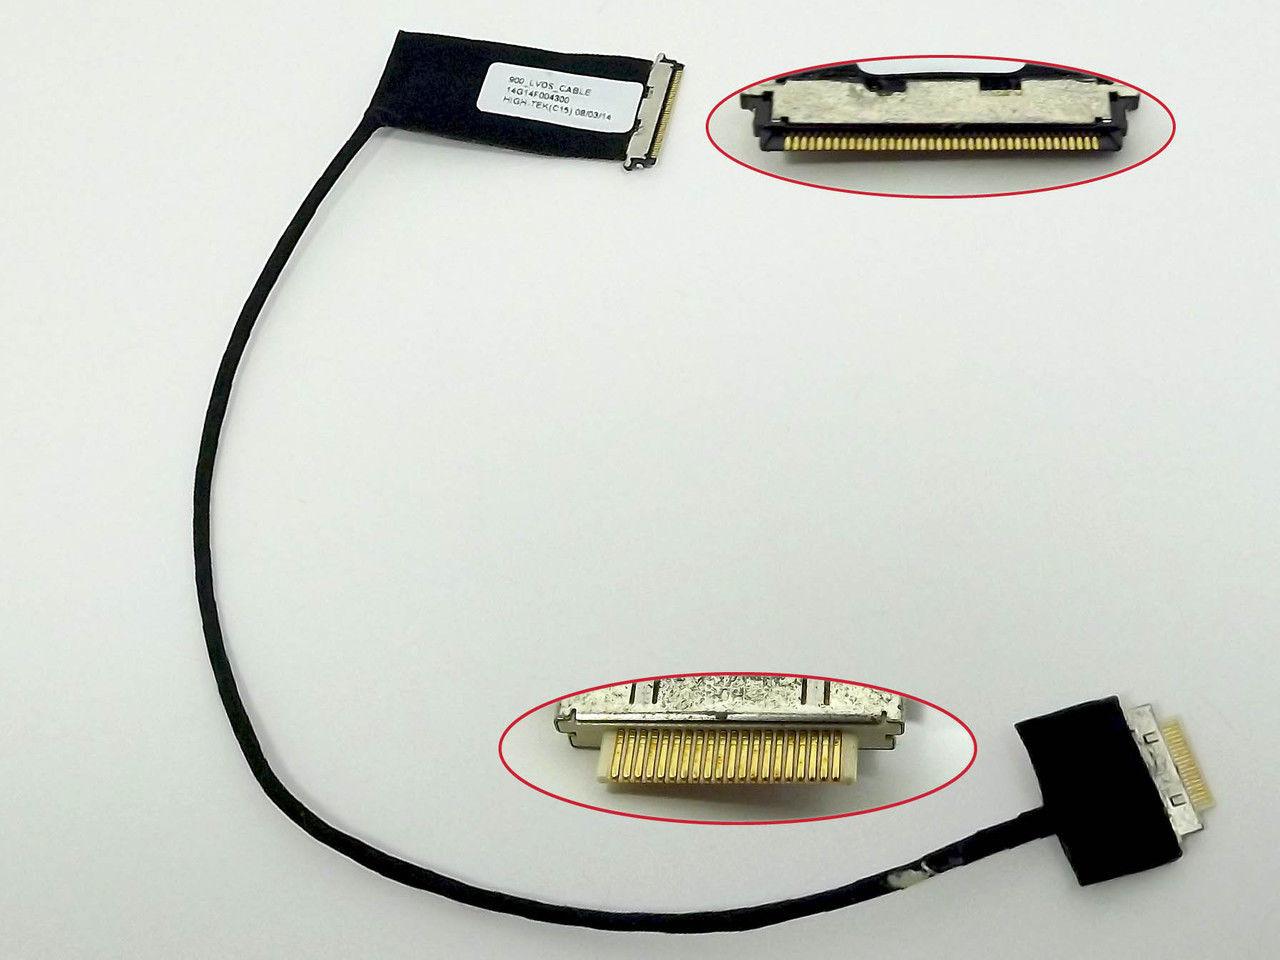 Шлейф матрицы ноутбука Asus X551CA Lcd Video cable Lvds 40PIN C разъемом под камеру. 14005-01070400